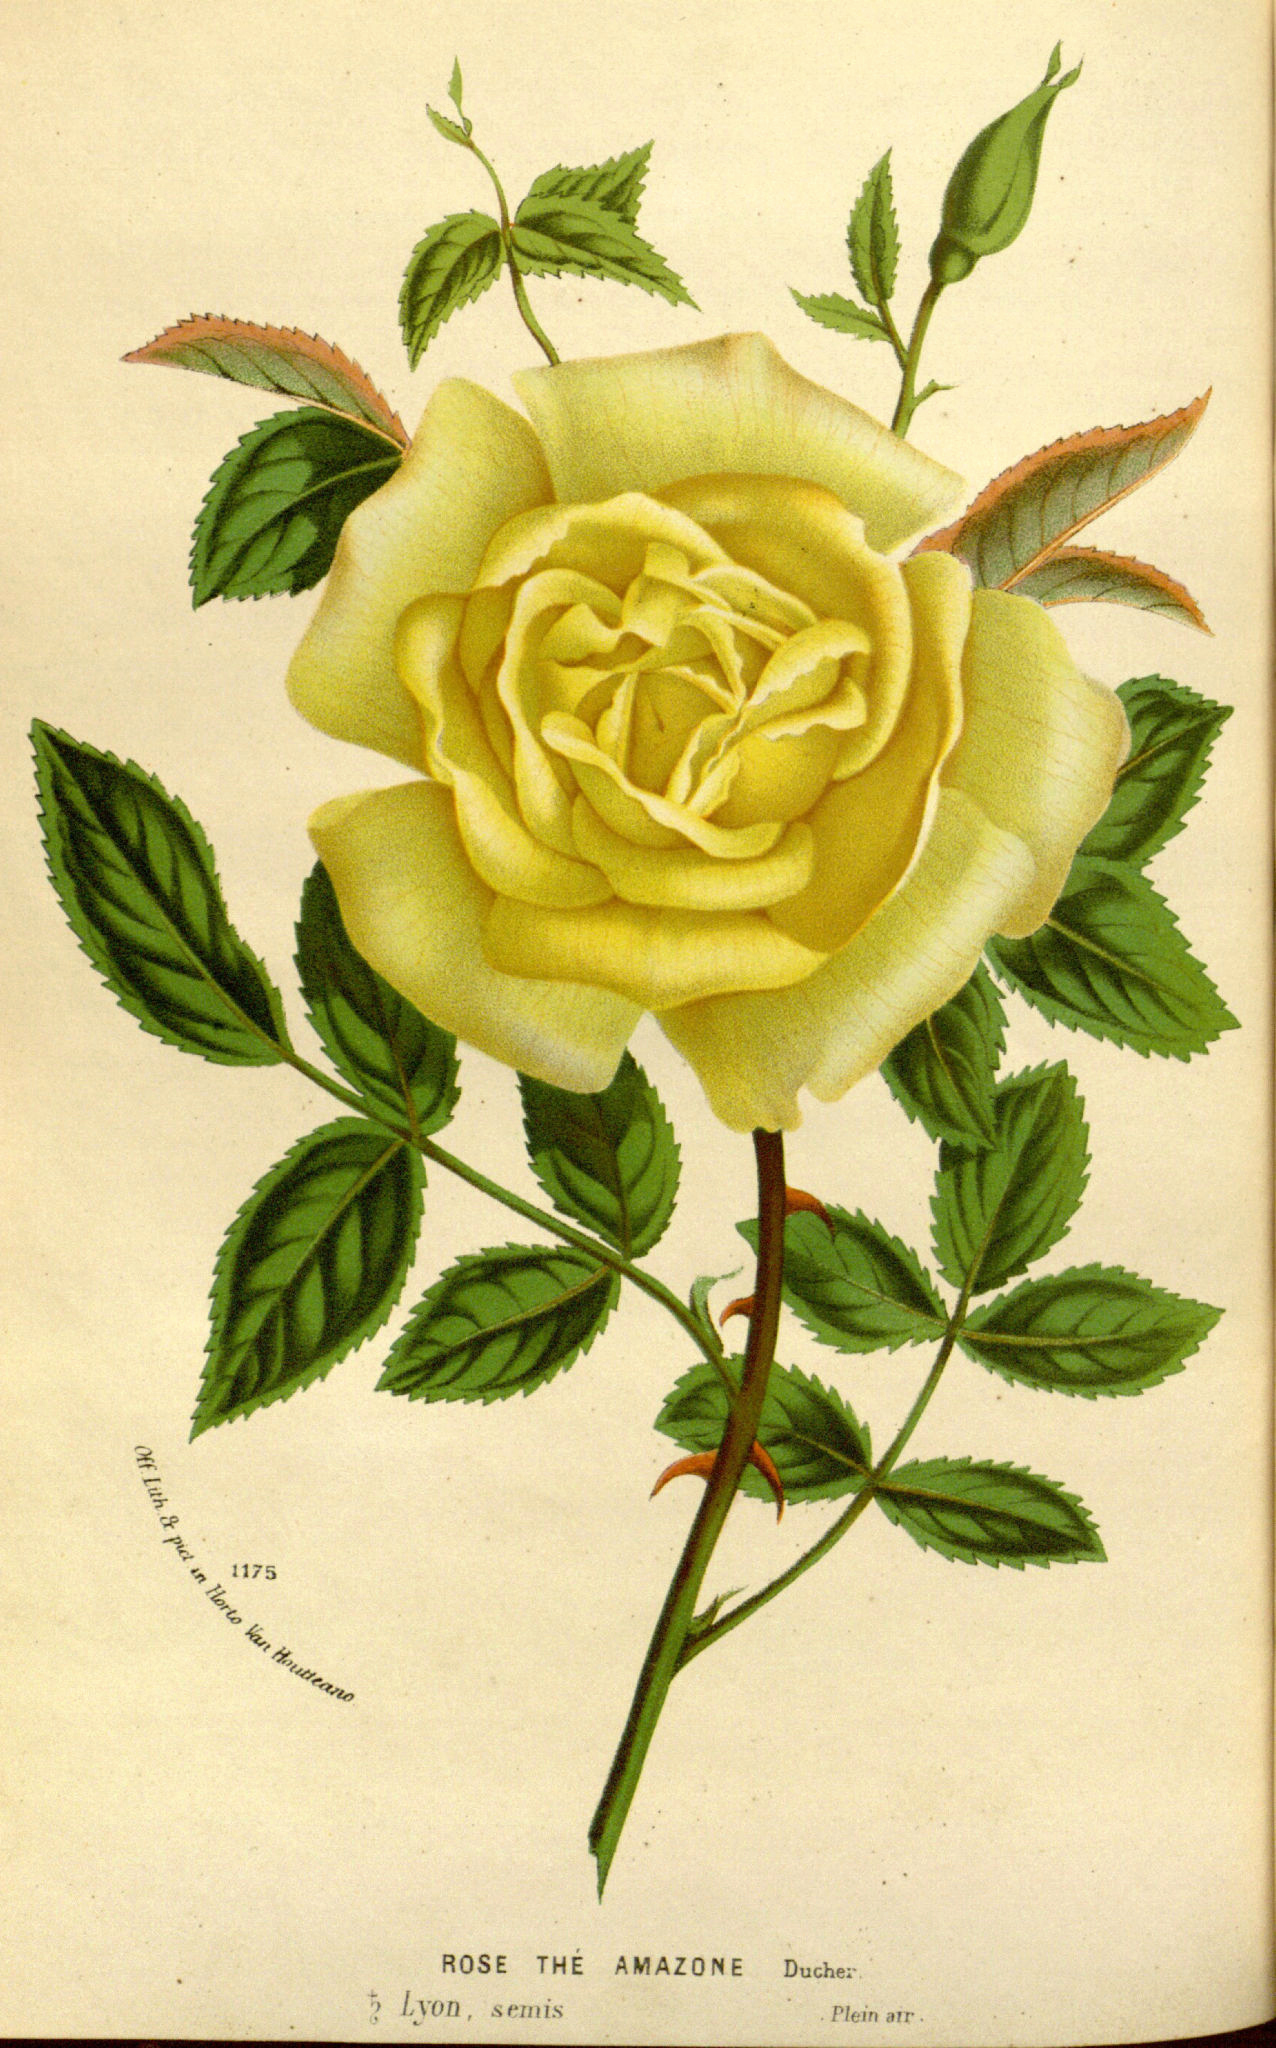 Les Serres De Gouaix Beau Collection Serre De Jardin Richel Unique Serres De Jardin Luxury Flore Serres